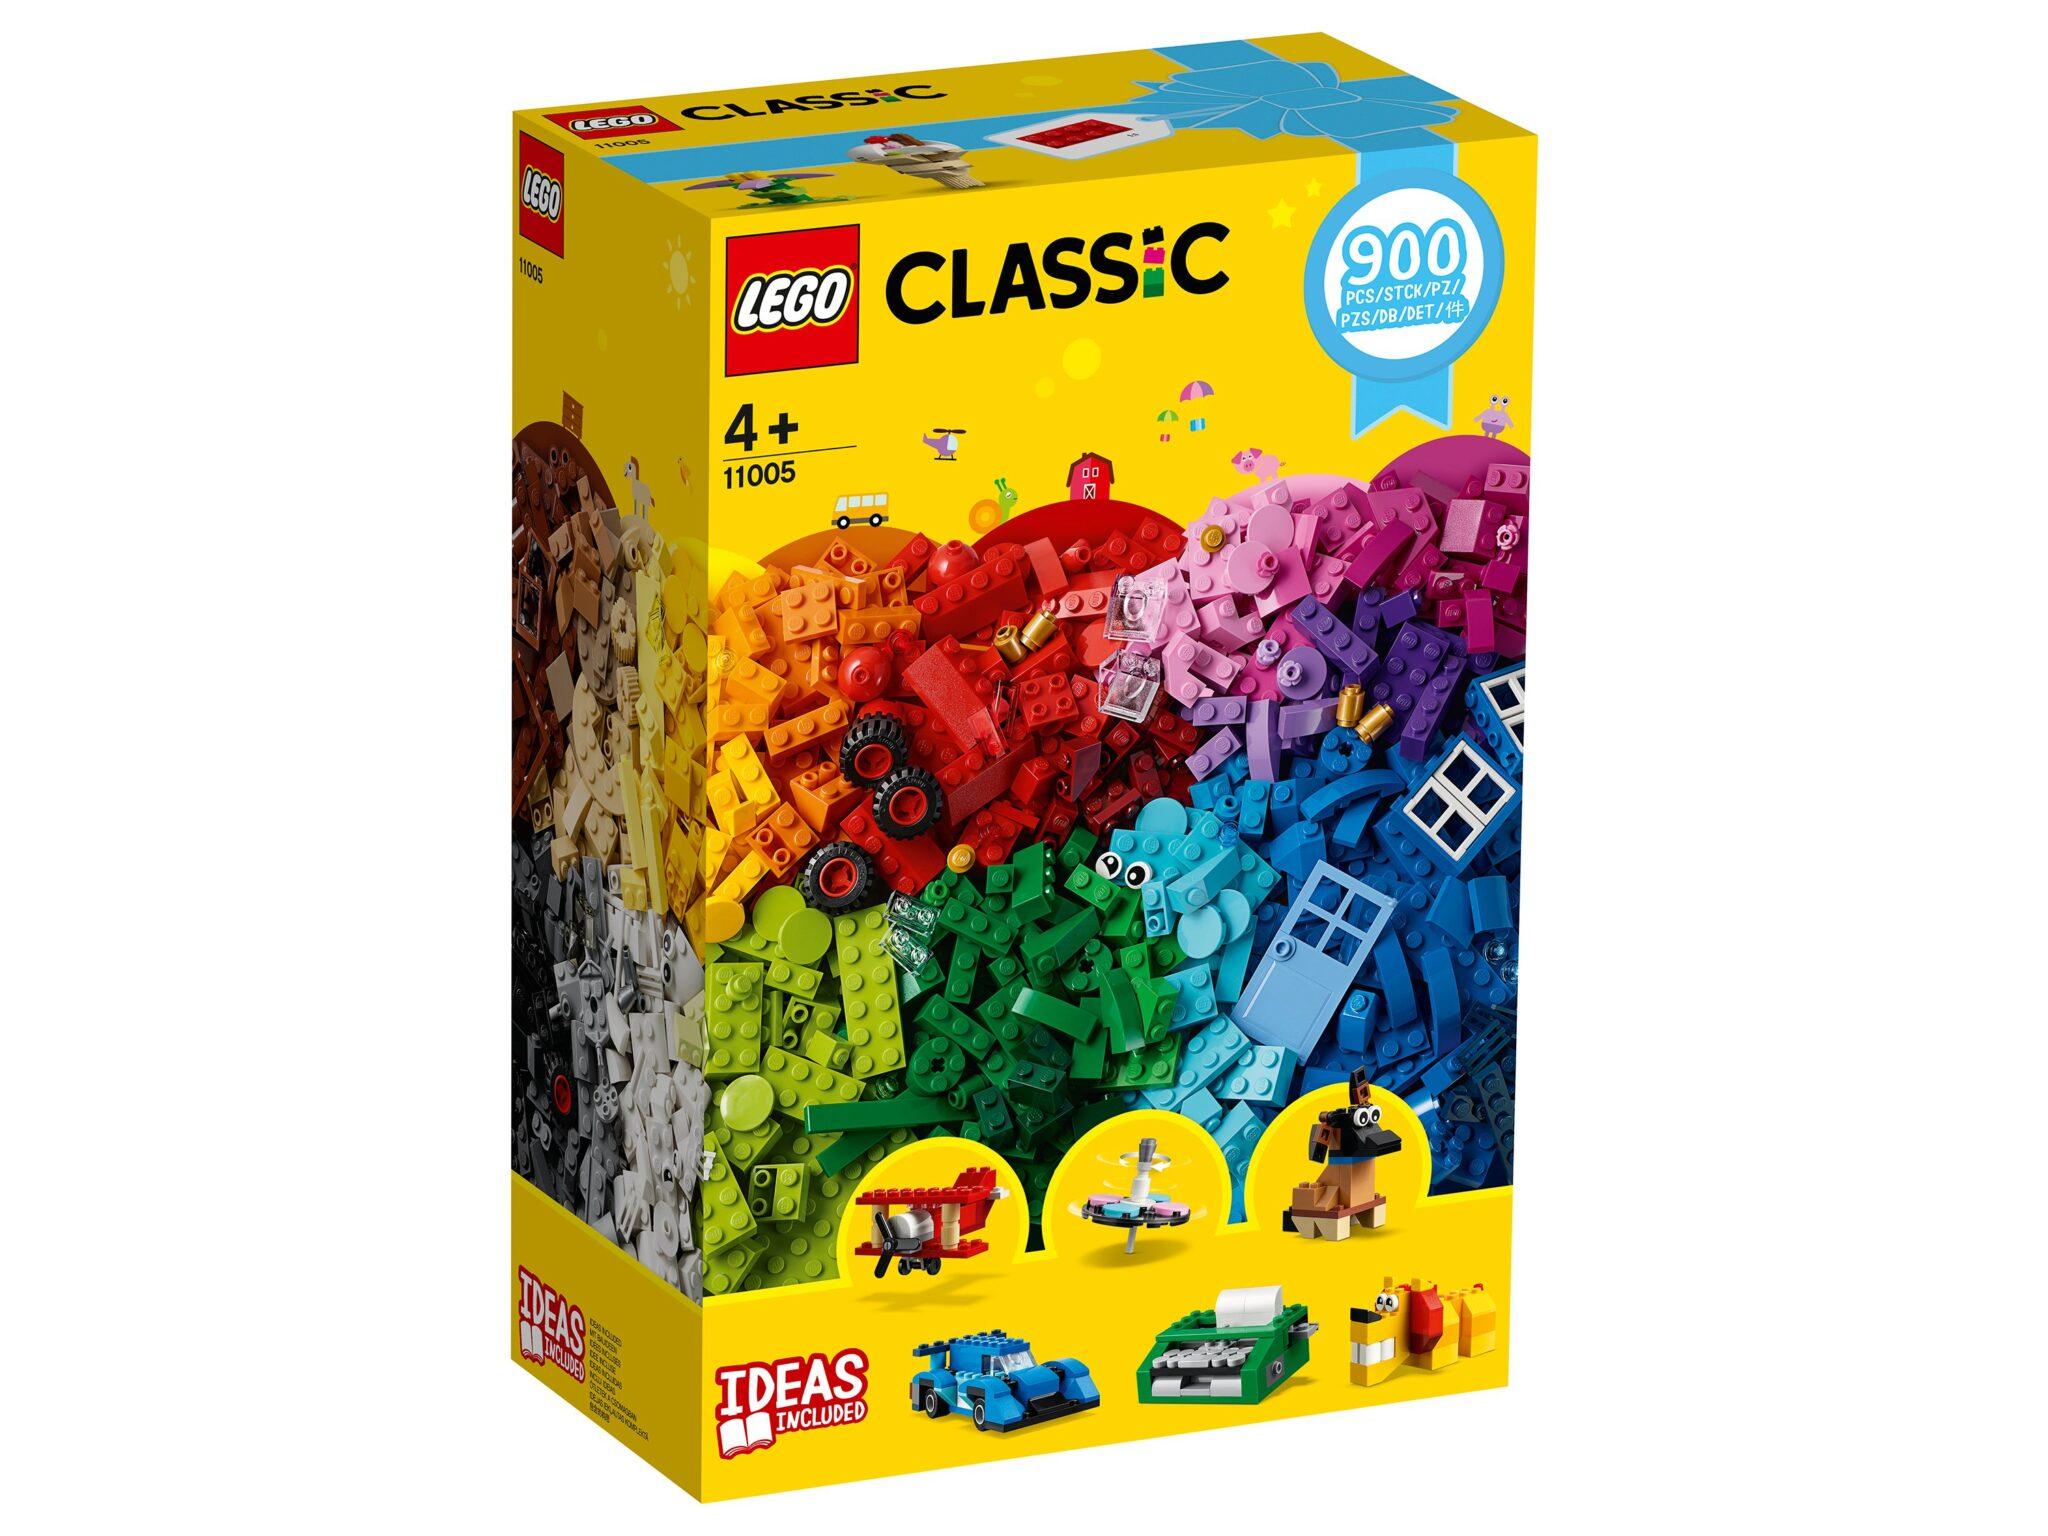 11005 Lego Classic - Весёлое творчество